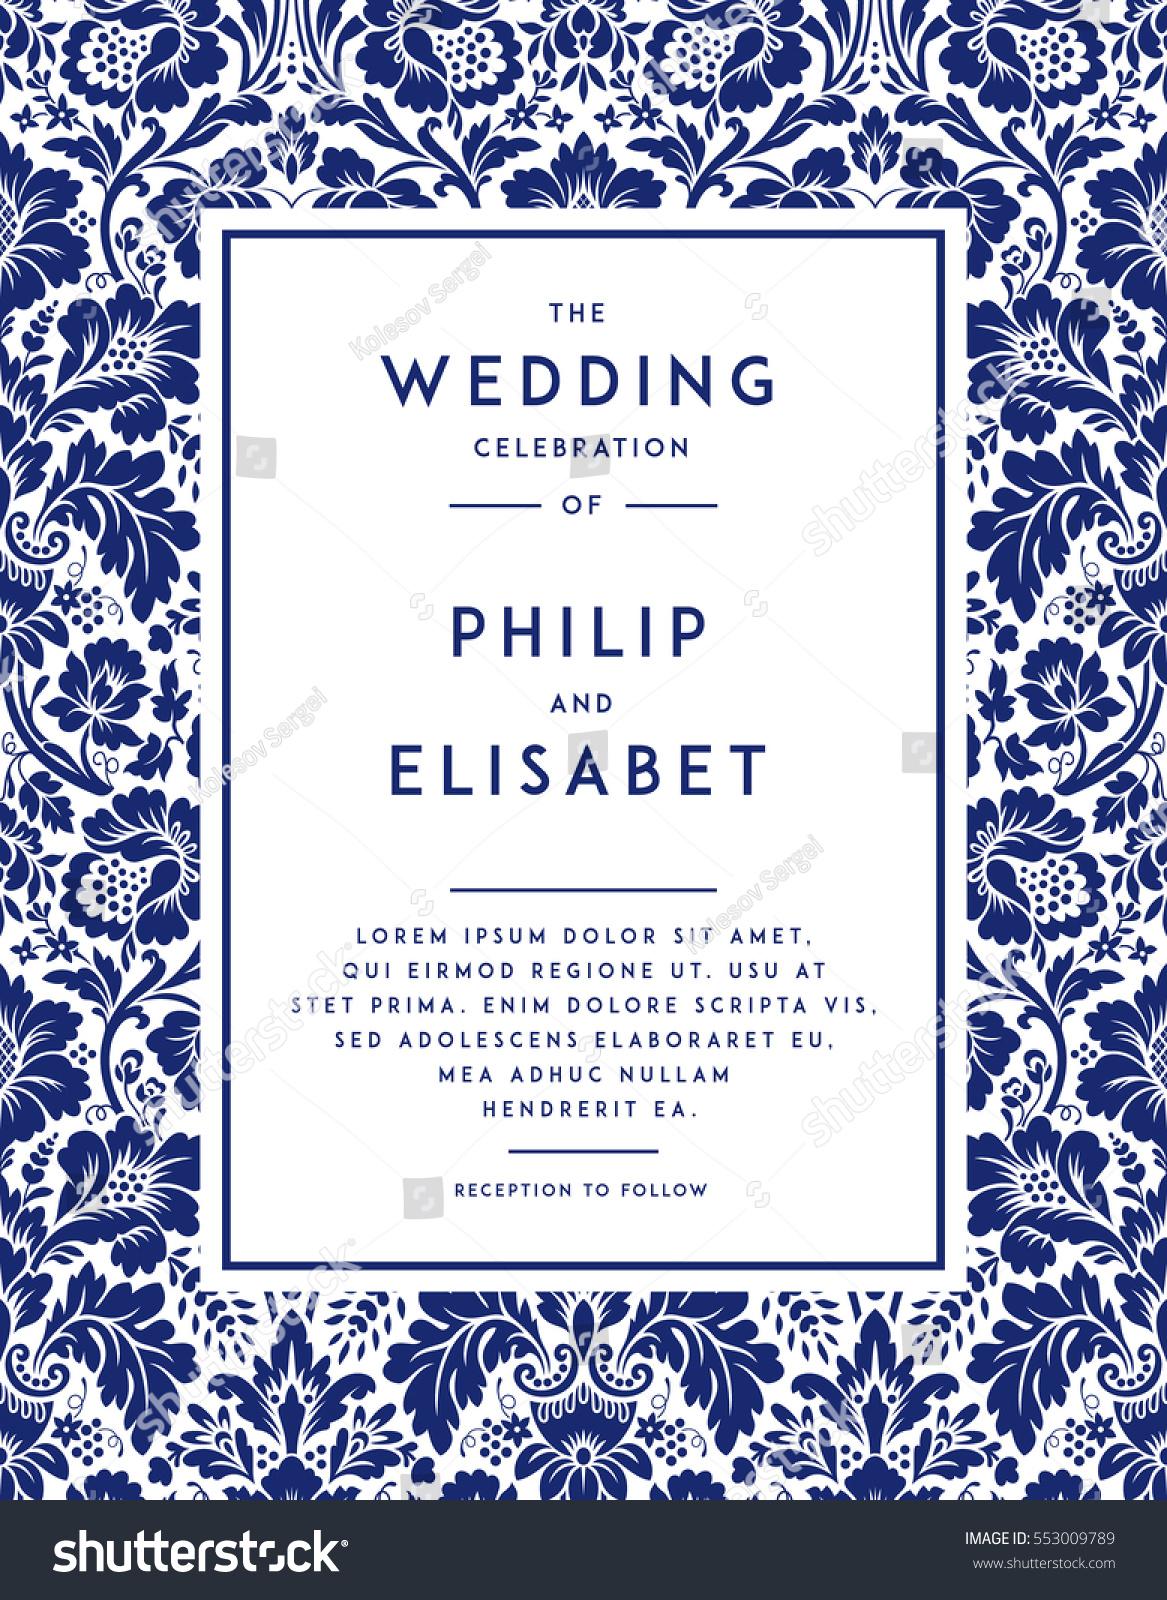 vintage wedding invitation template modern design wedding invitation design with damask background tradition - Vintage Wedding Invitation Templates